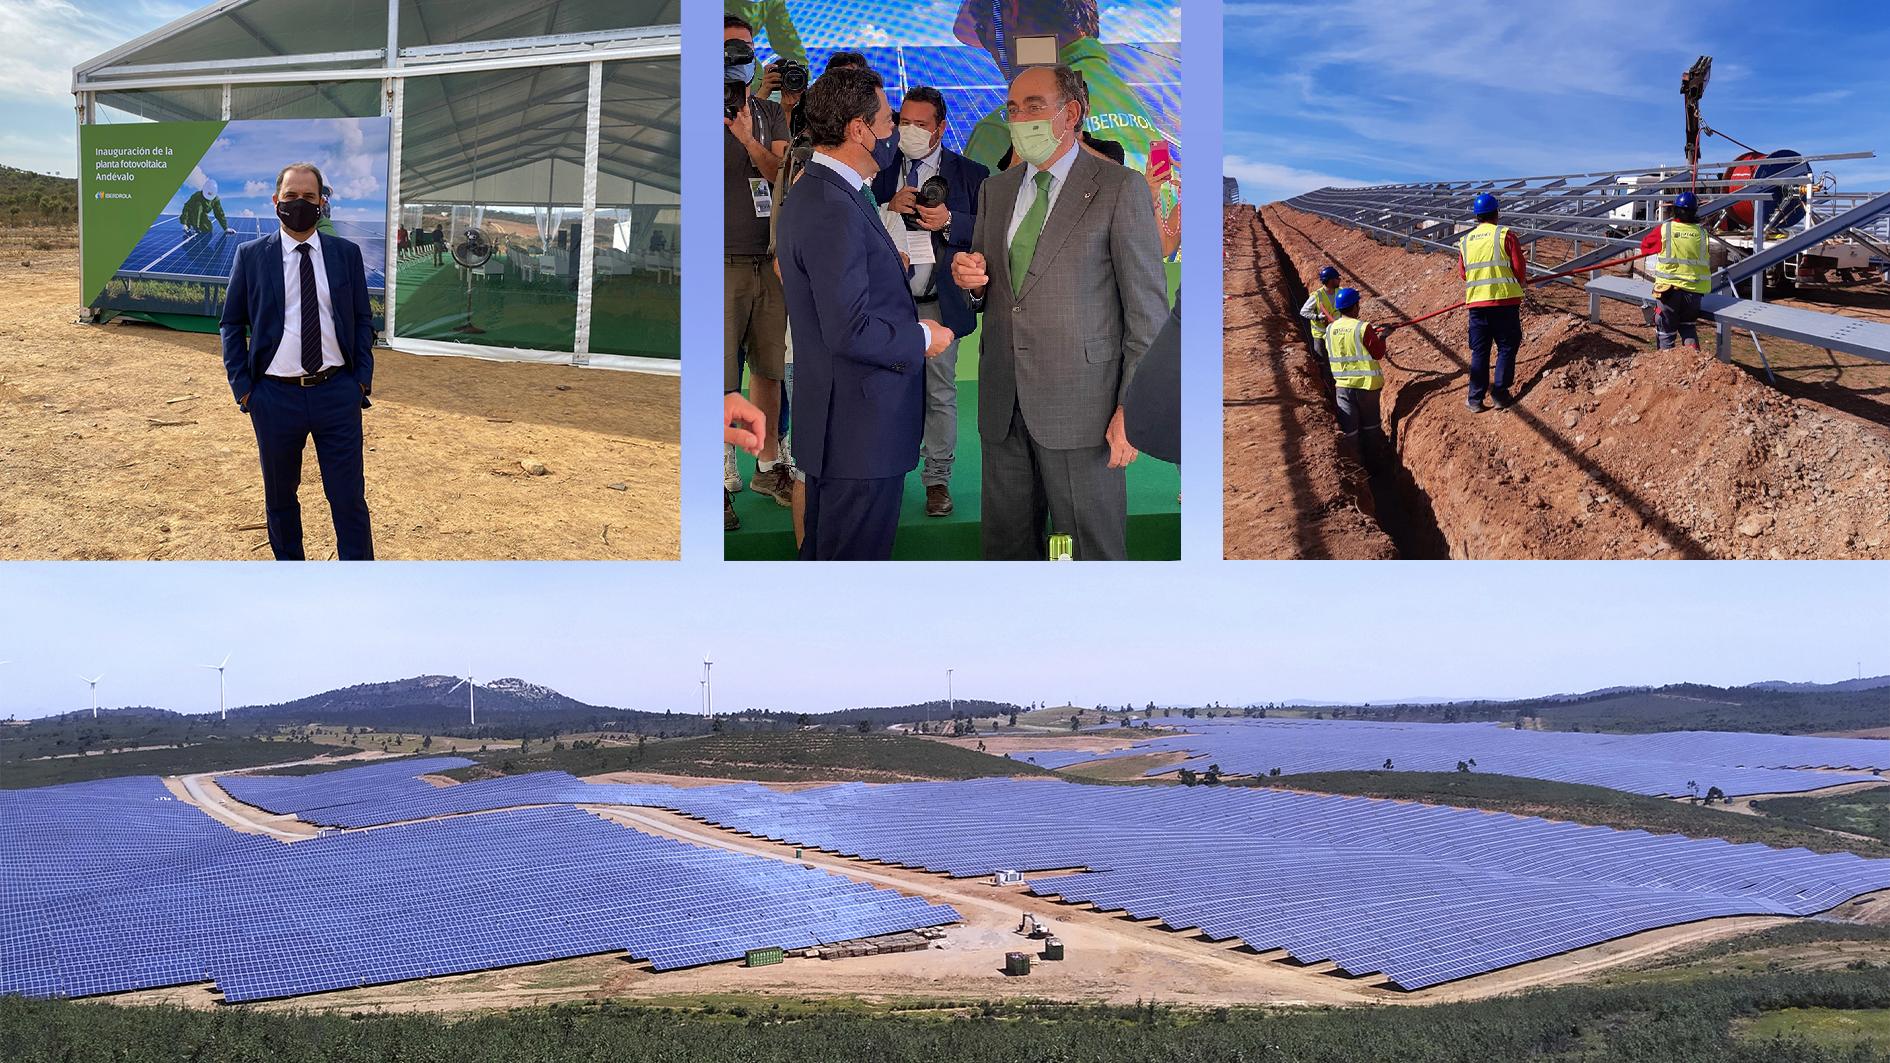 Iberdrola inaugurates the Andévalo Solar Plant, built by Eiffage Energía